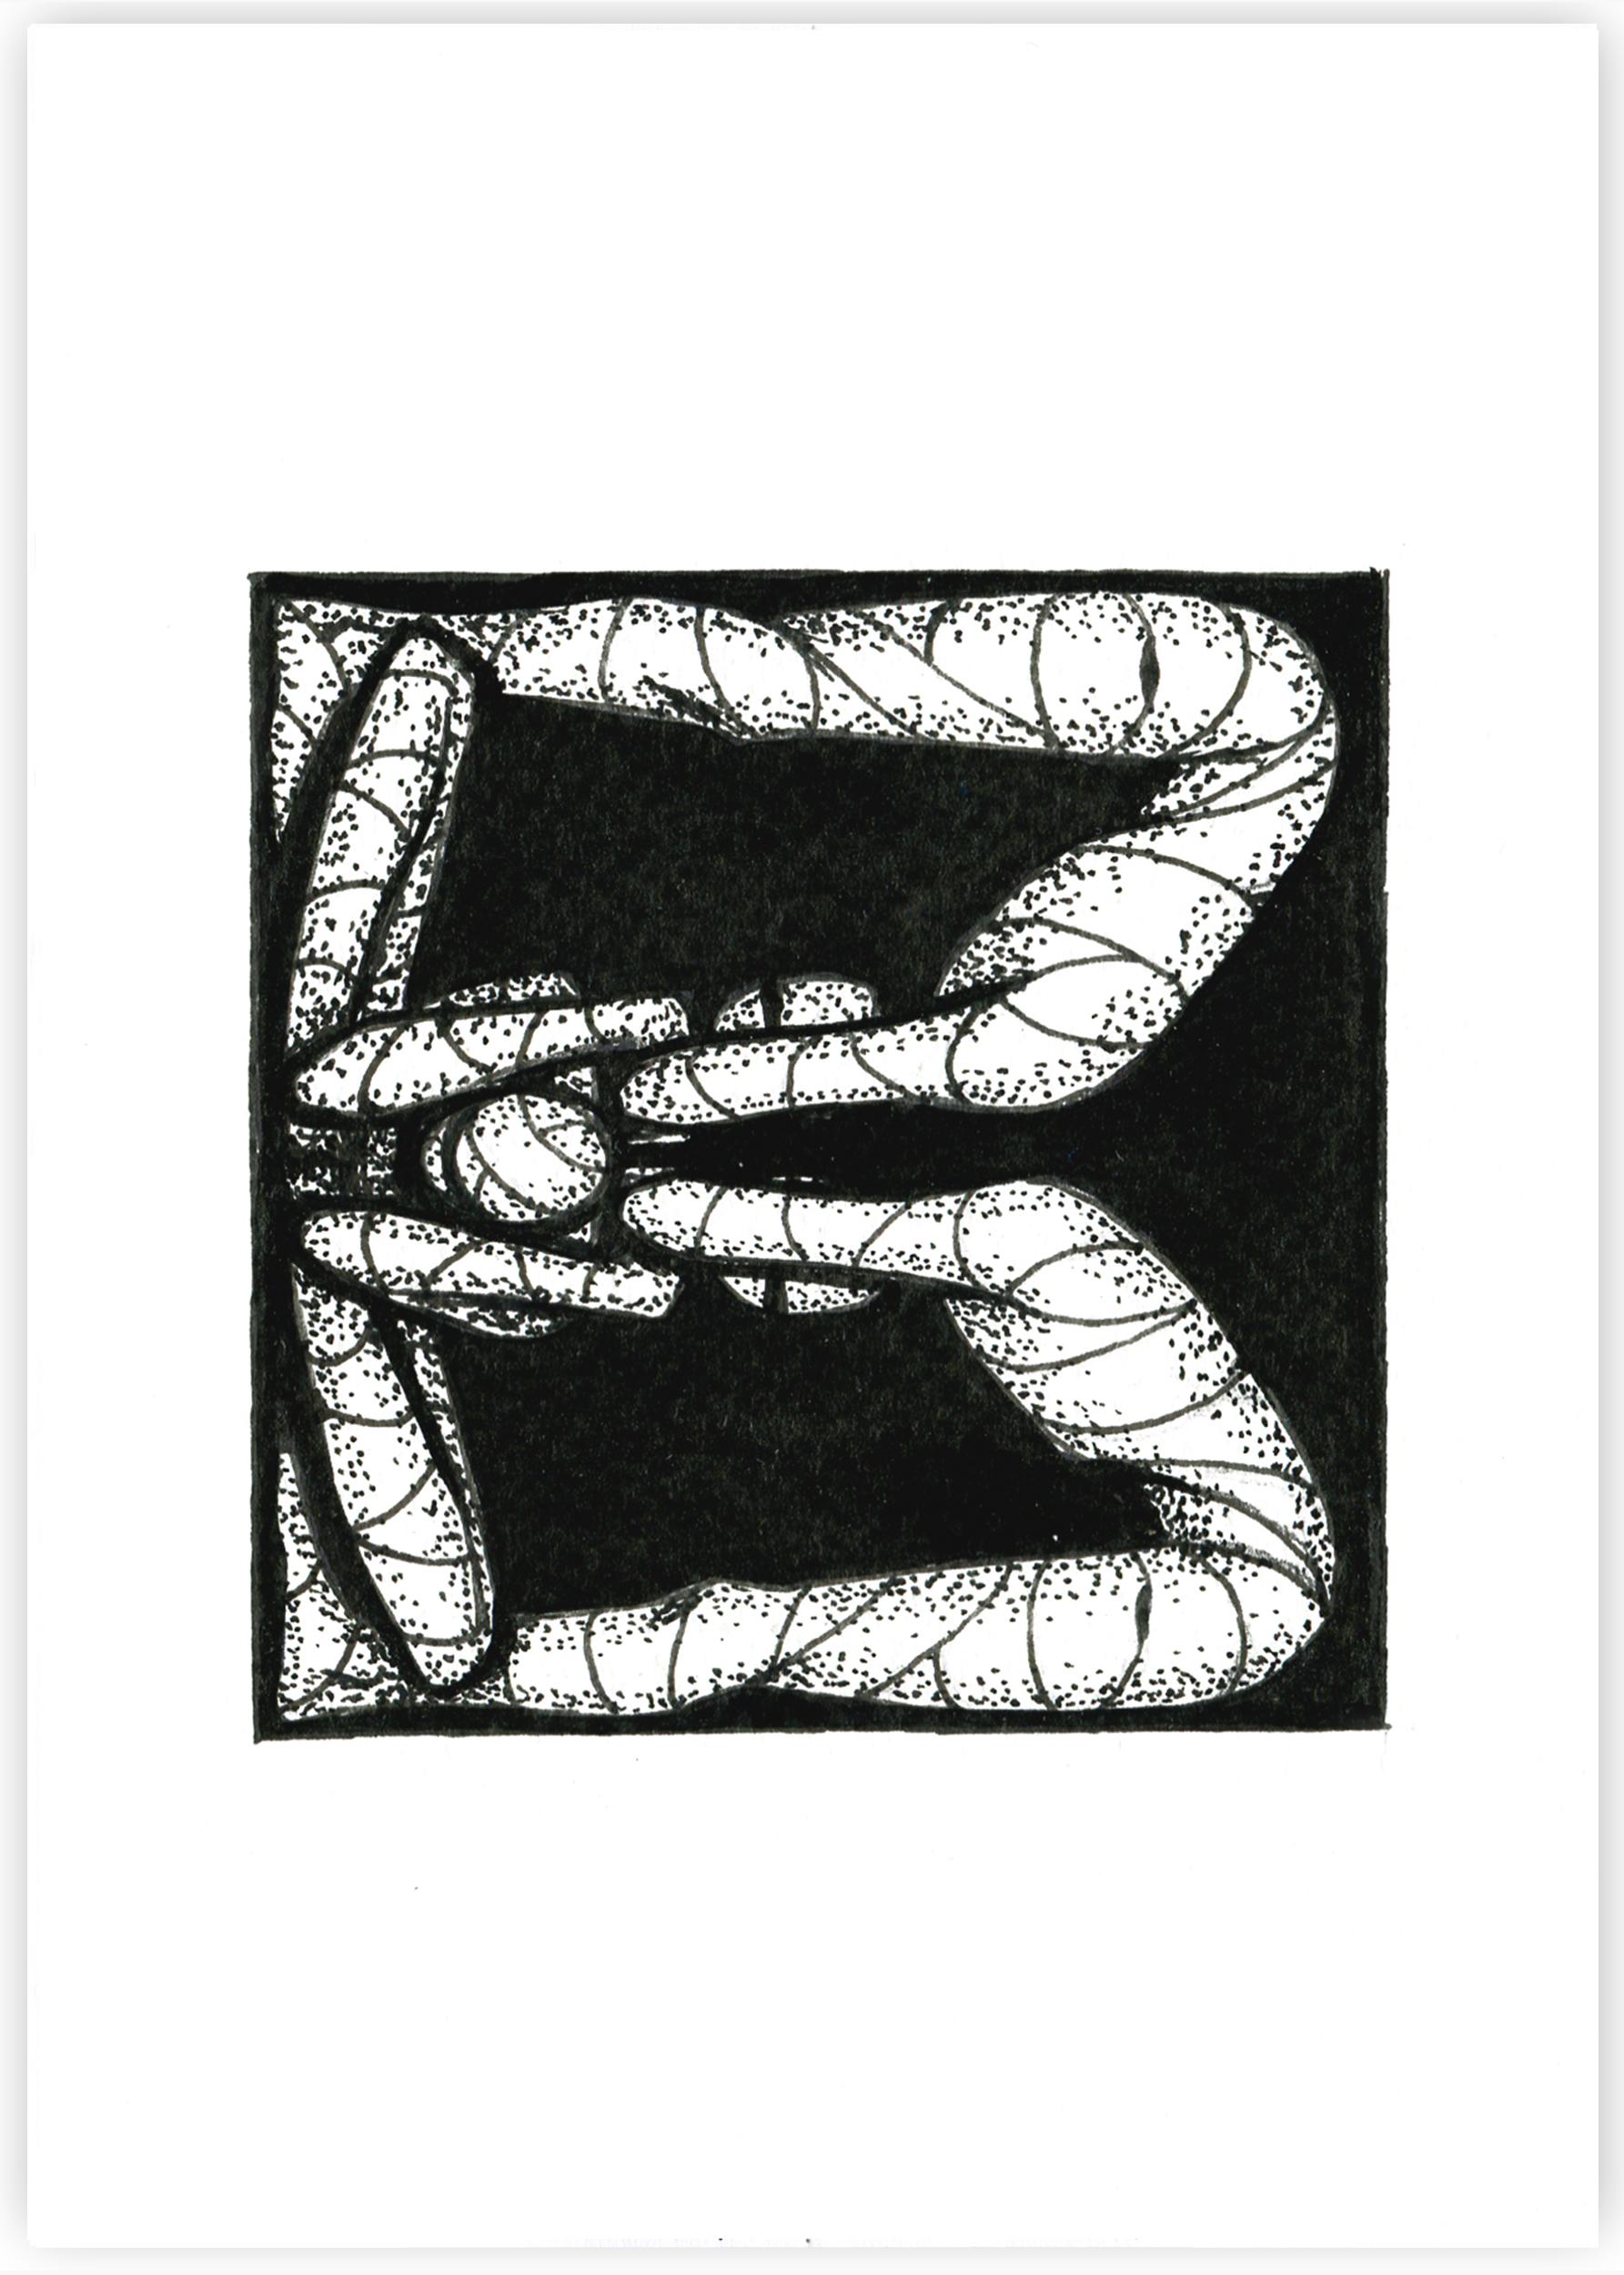 David Wrightman - Persephone grey outline  copy.jpg